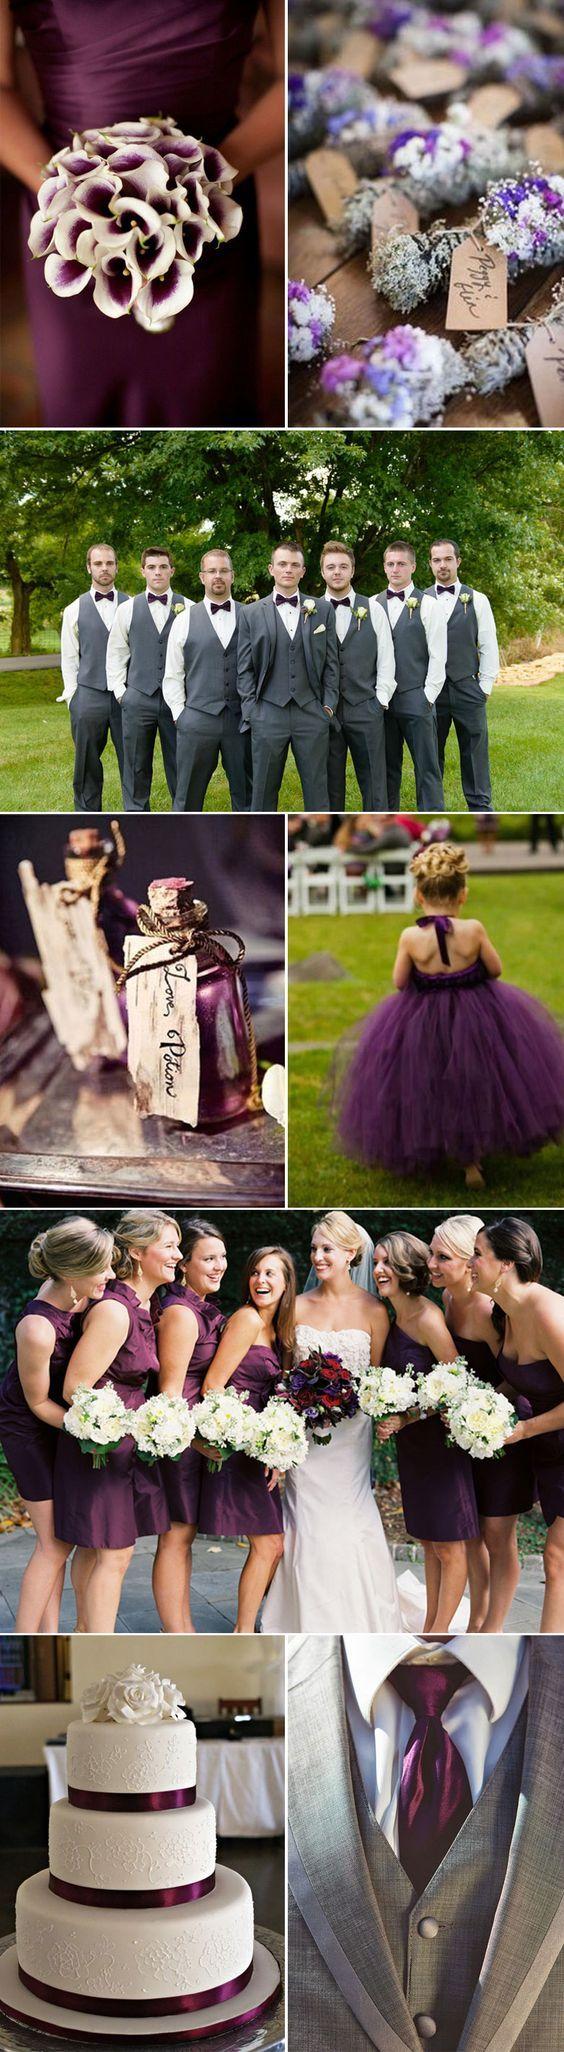 Perfect Plum Wedding Ideas and Inspiration: